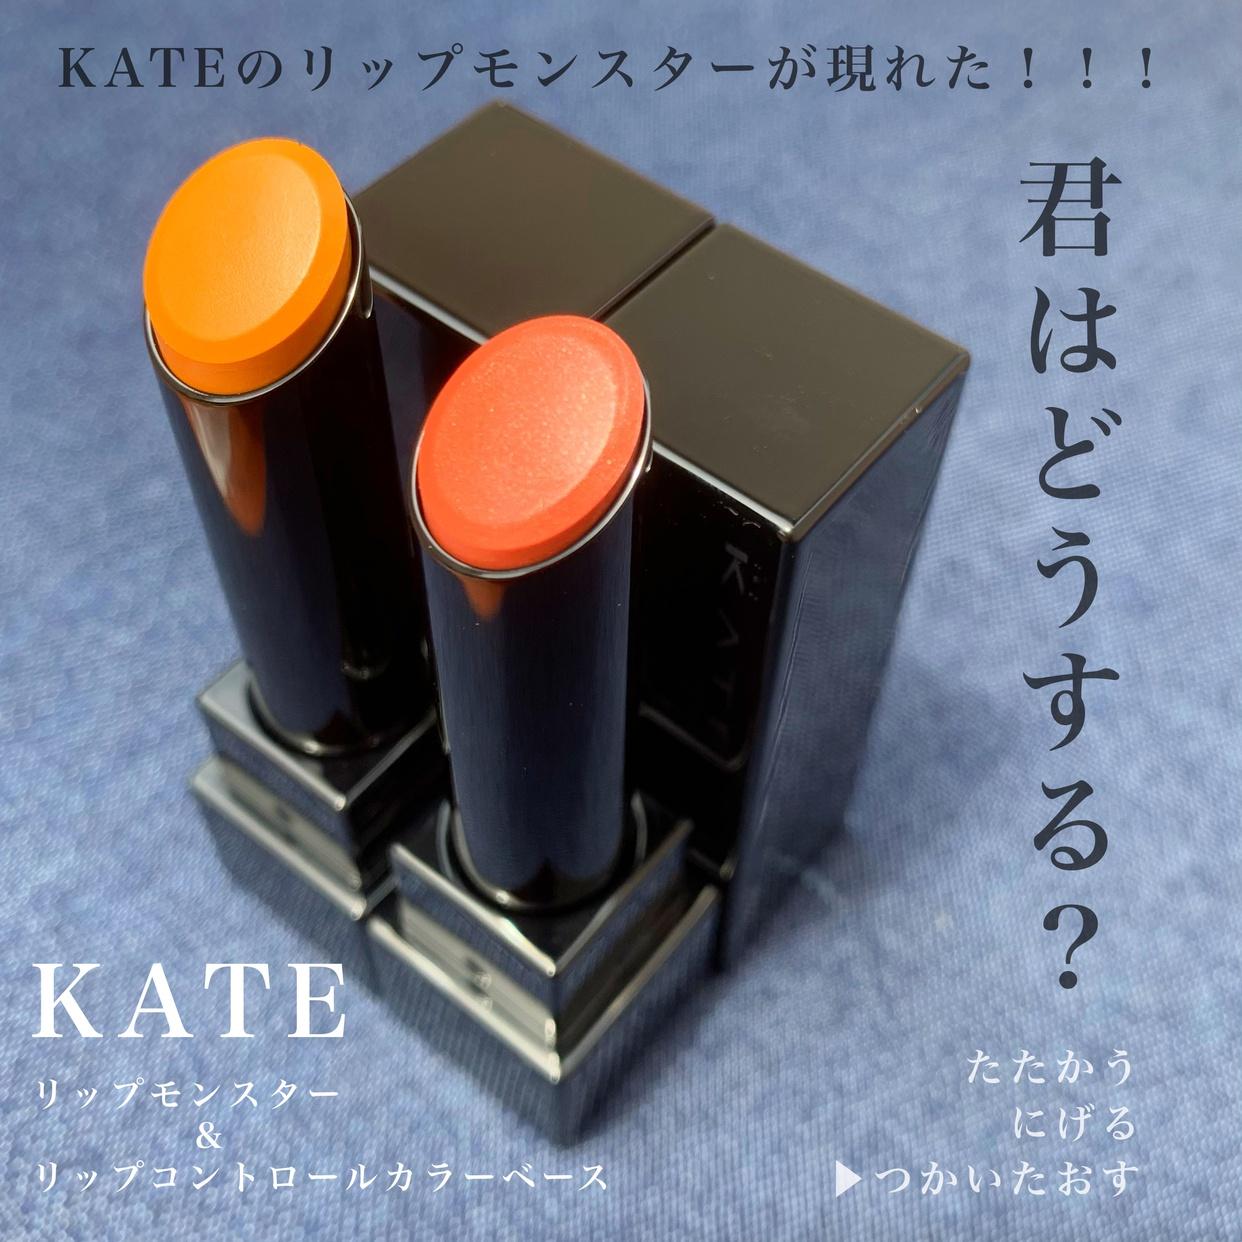 KATE(ケイト) リップモンスターを使ったKeiさんのクチコミ画像1